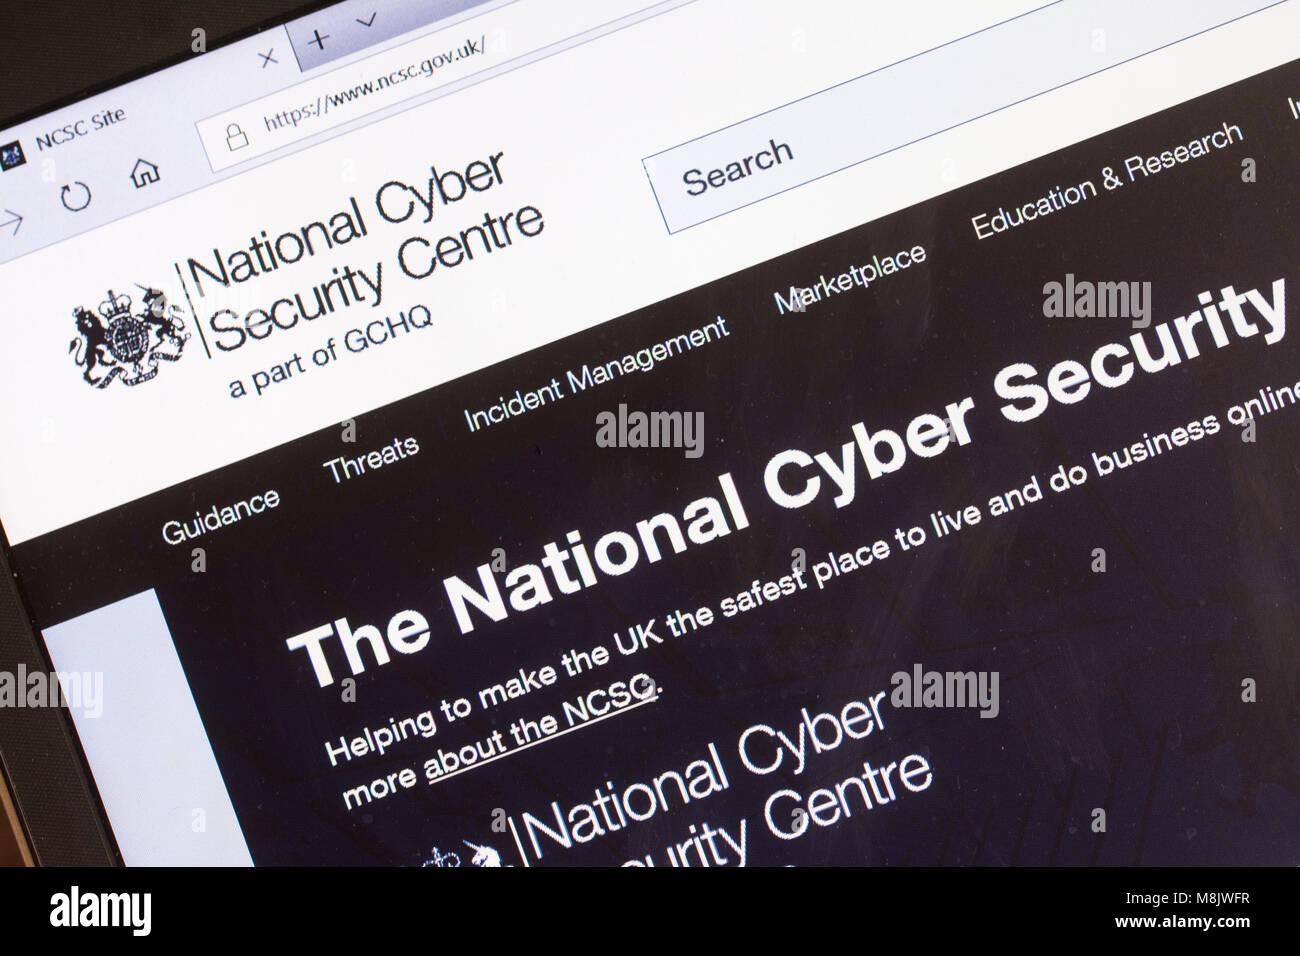 Computer screenshot of NCSC.gov website (National Cyber Security Centre) - Stock Image